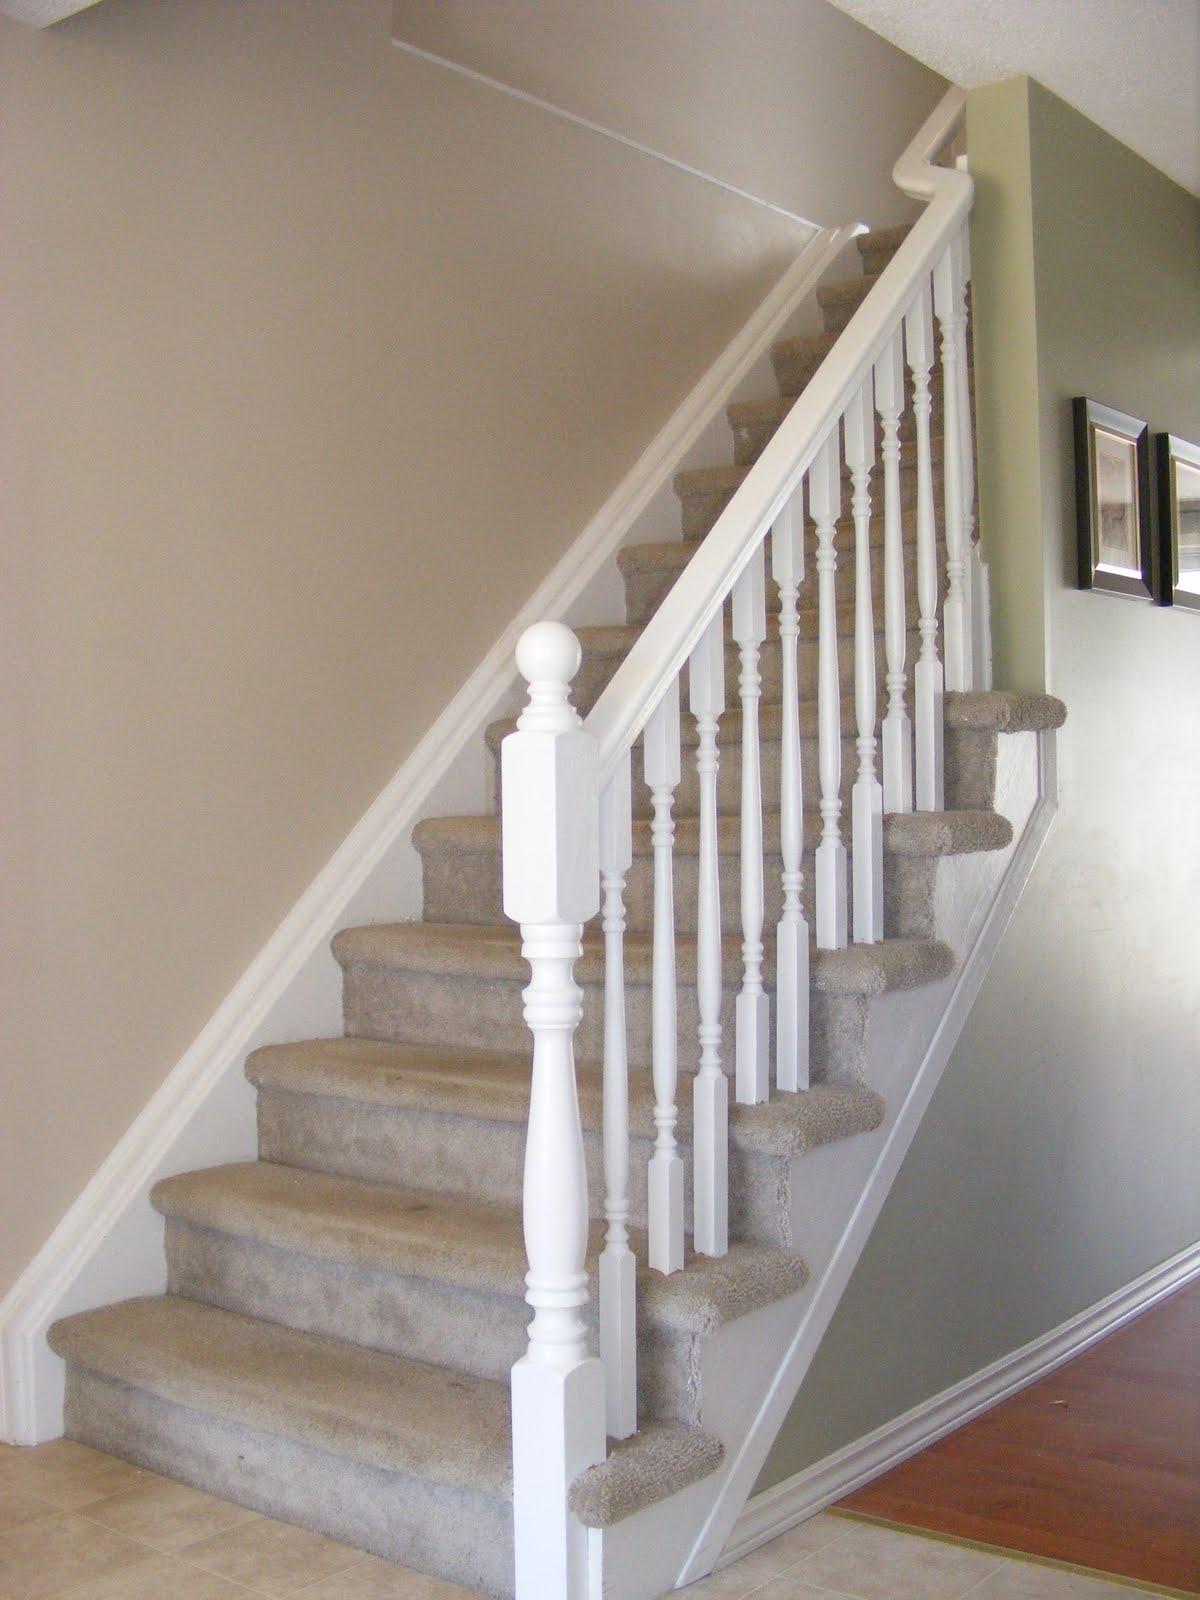 Indoor Stair Railings Designs Joy Studio Design Gallery Best Design